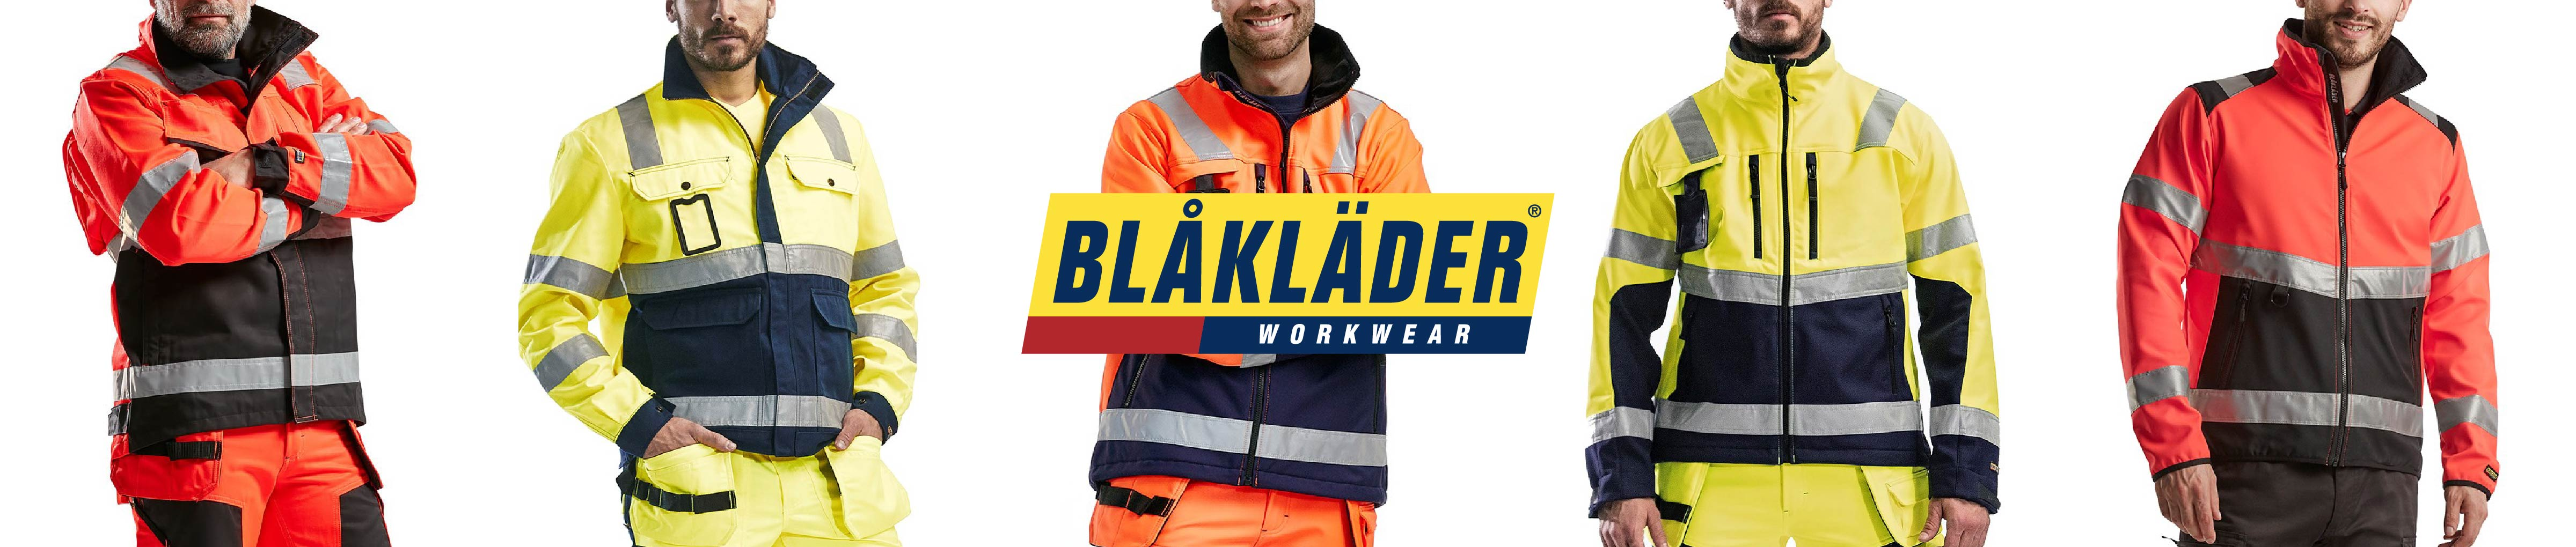 High vis work jackets